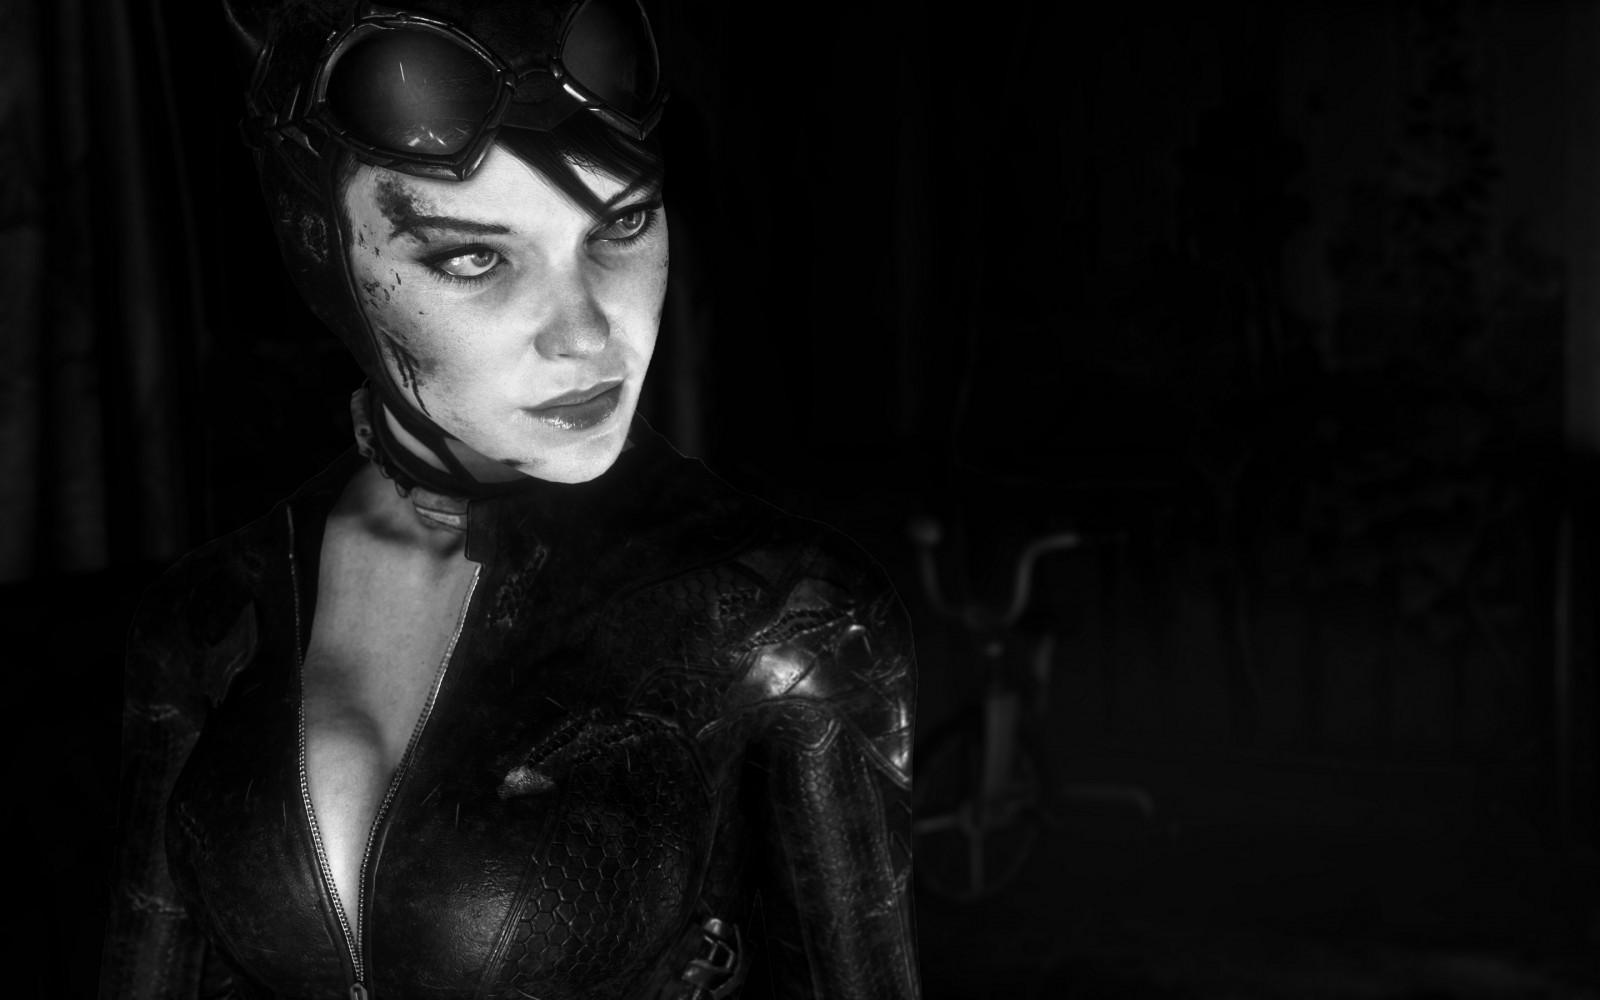 Catwoman Batman Arkham Knight Warner Bros